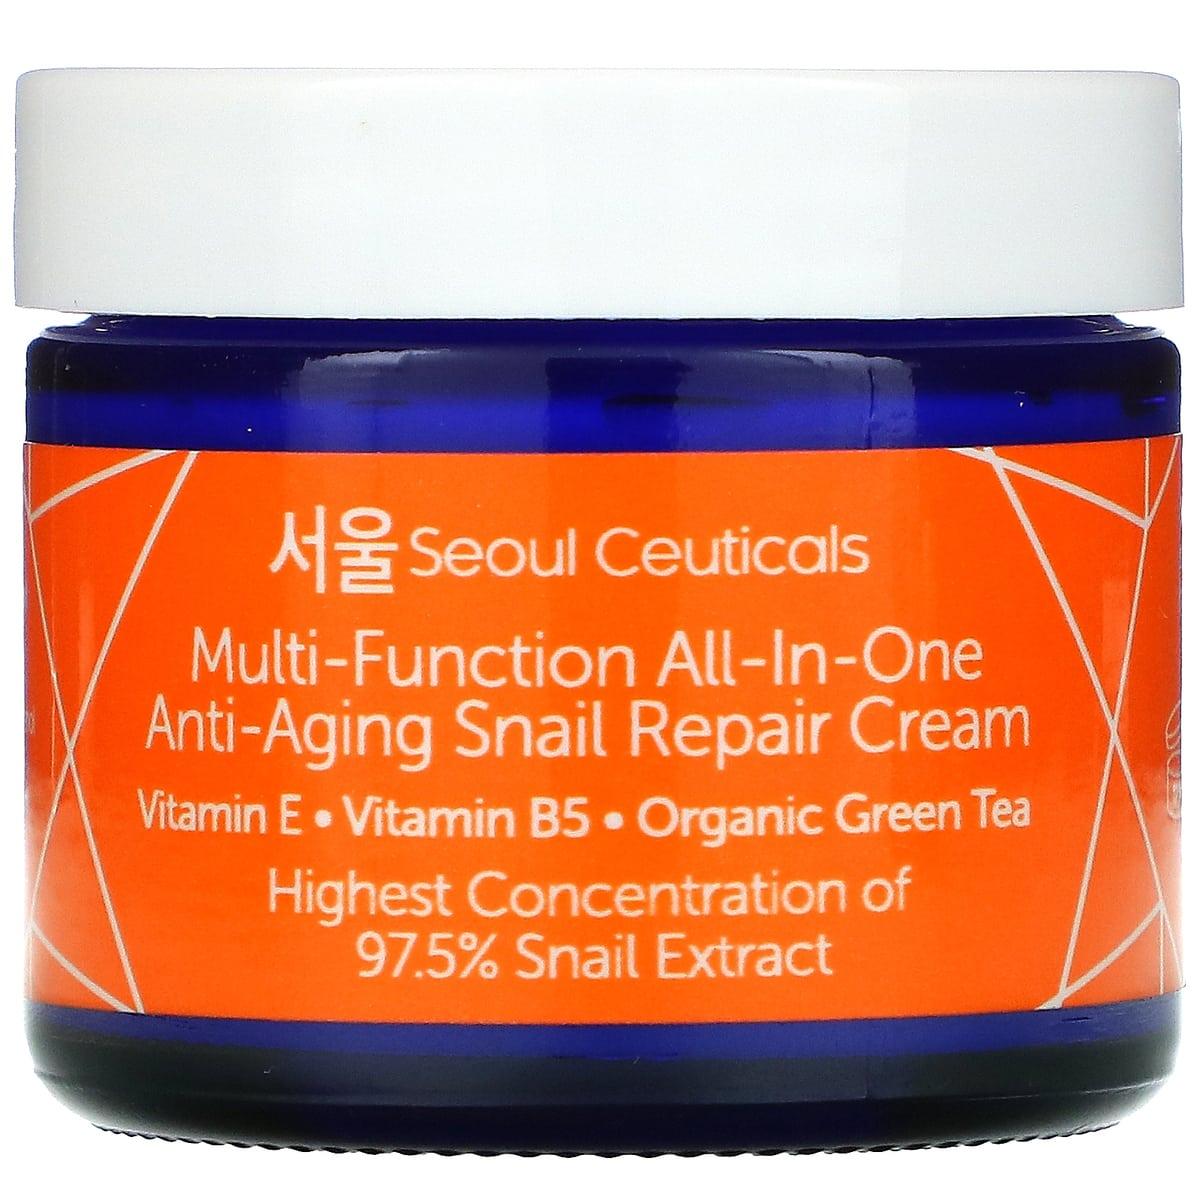 SeoulCeuticals All-in-One Snail Repair Korean Moisturizer Cream